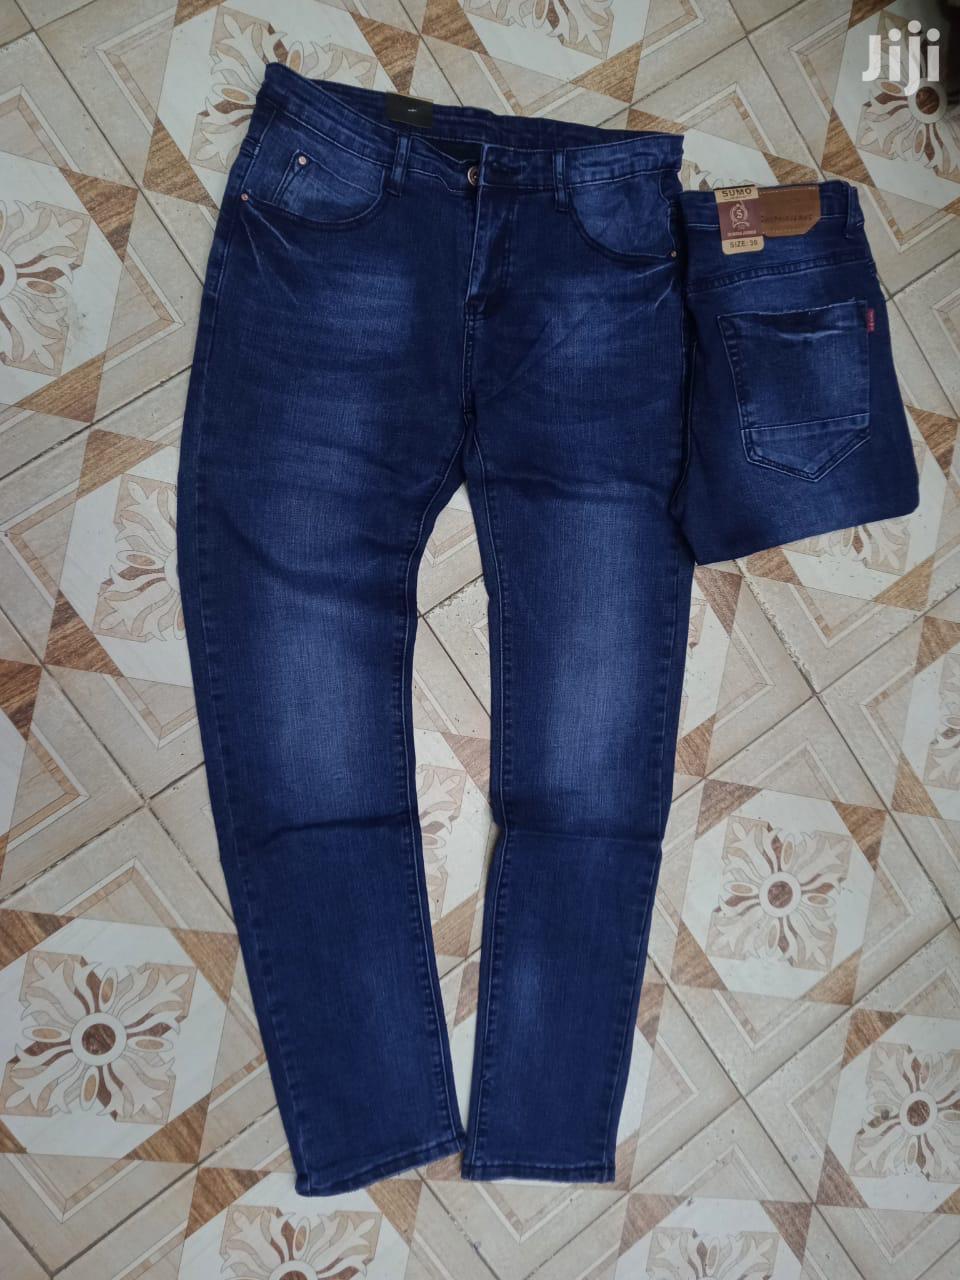 Men'S Jeans Available | Clothing for sale in Nairobi Central, Nairobi, Kenya